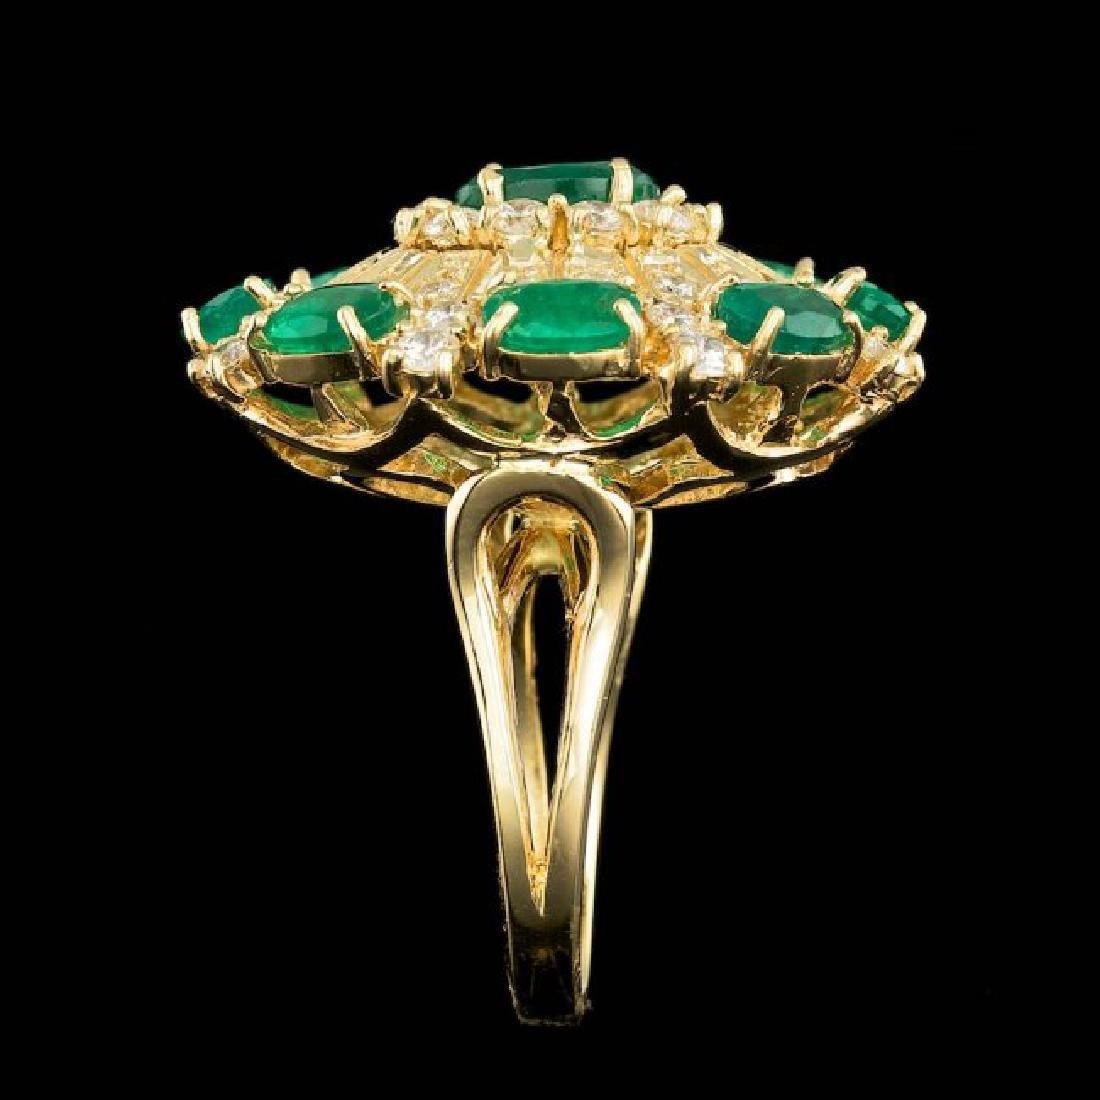 14k Gold 5.00ct Emerald 2.00ct Diamond Ring - 4